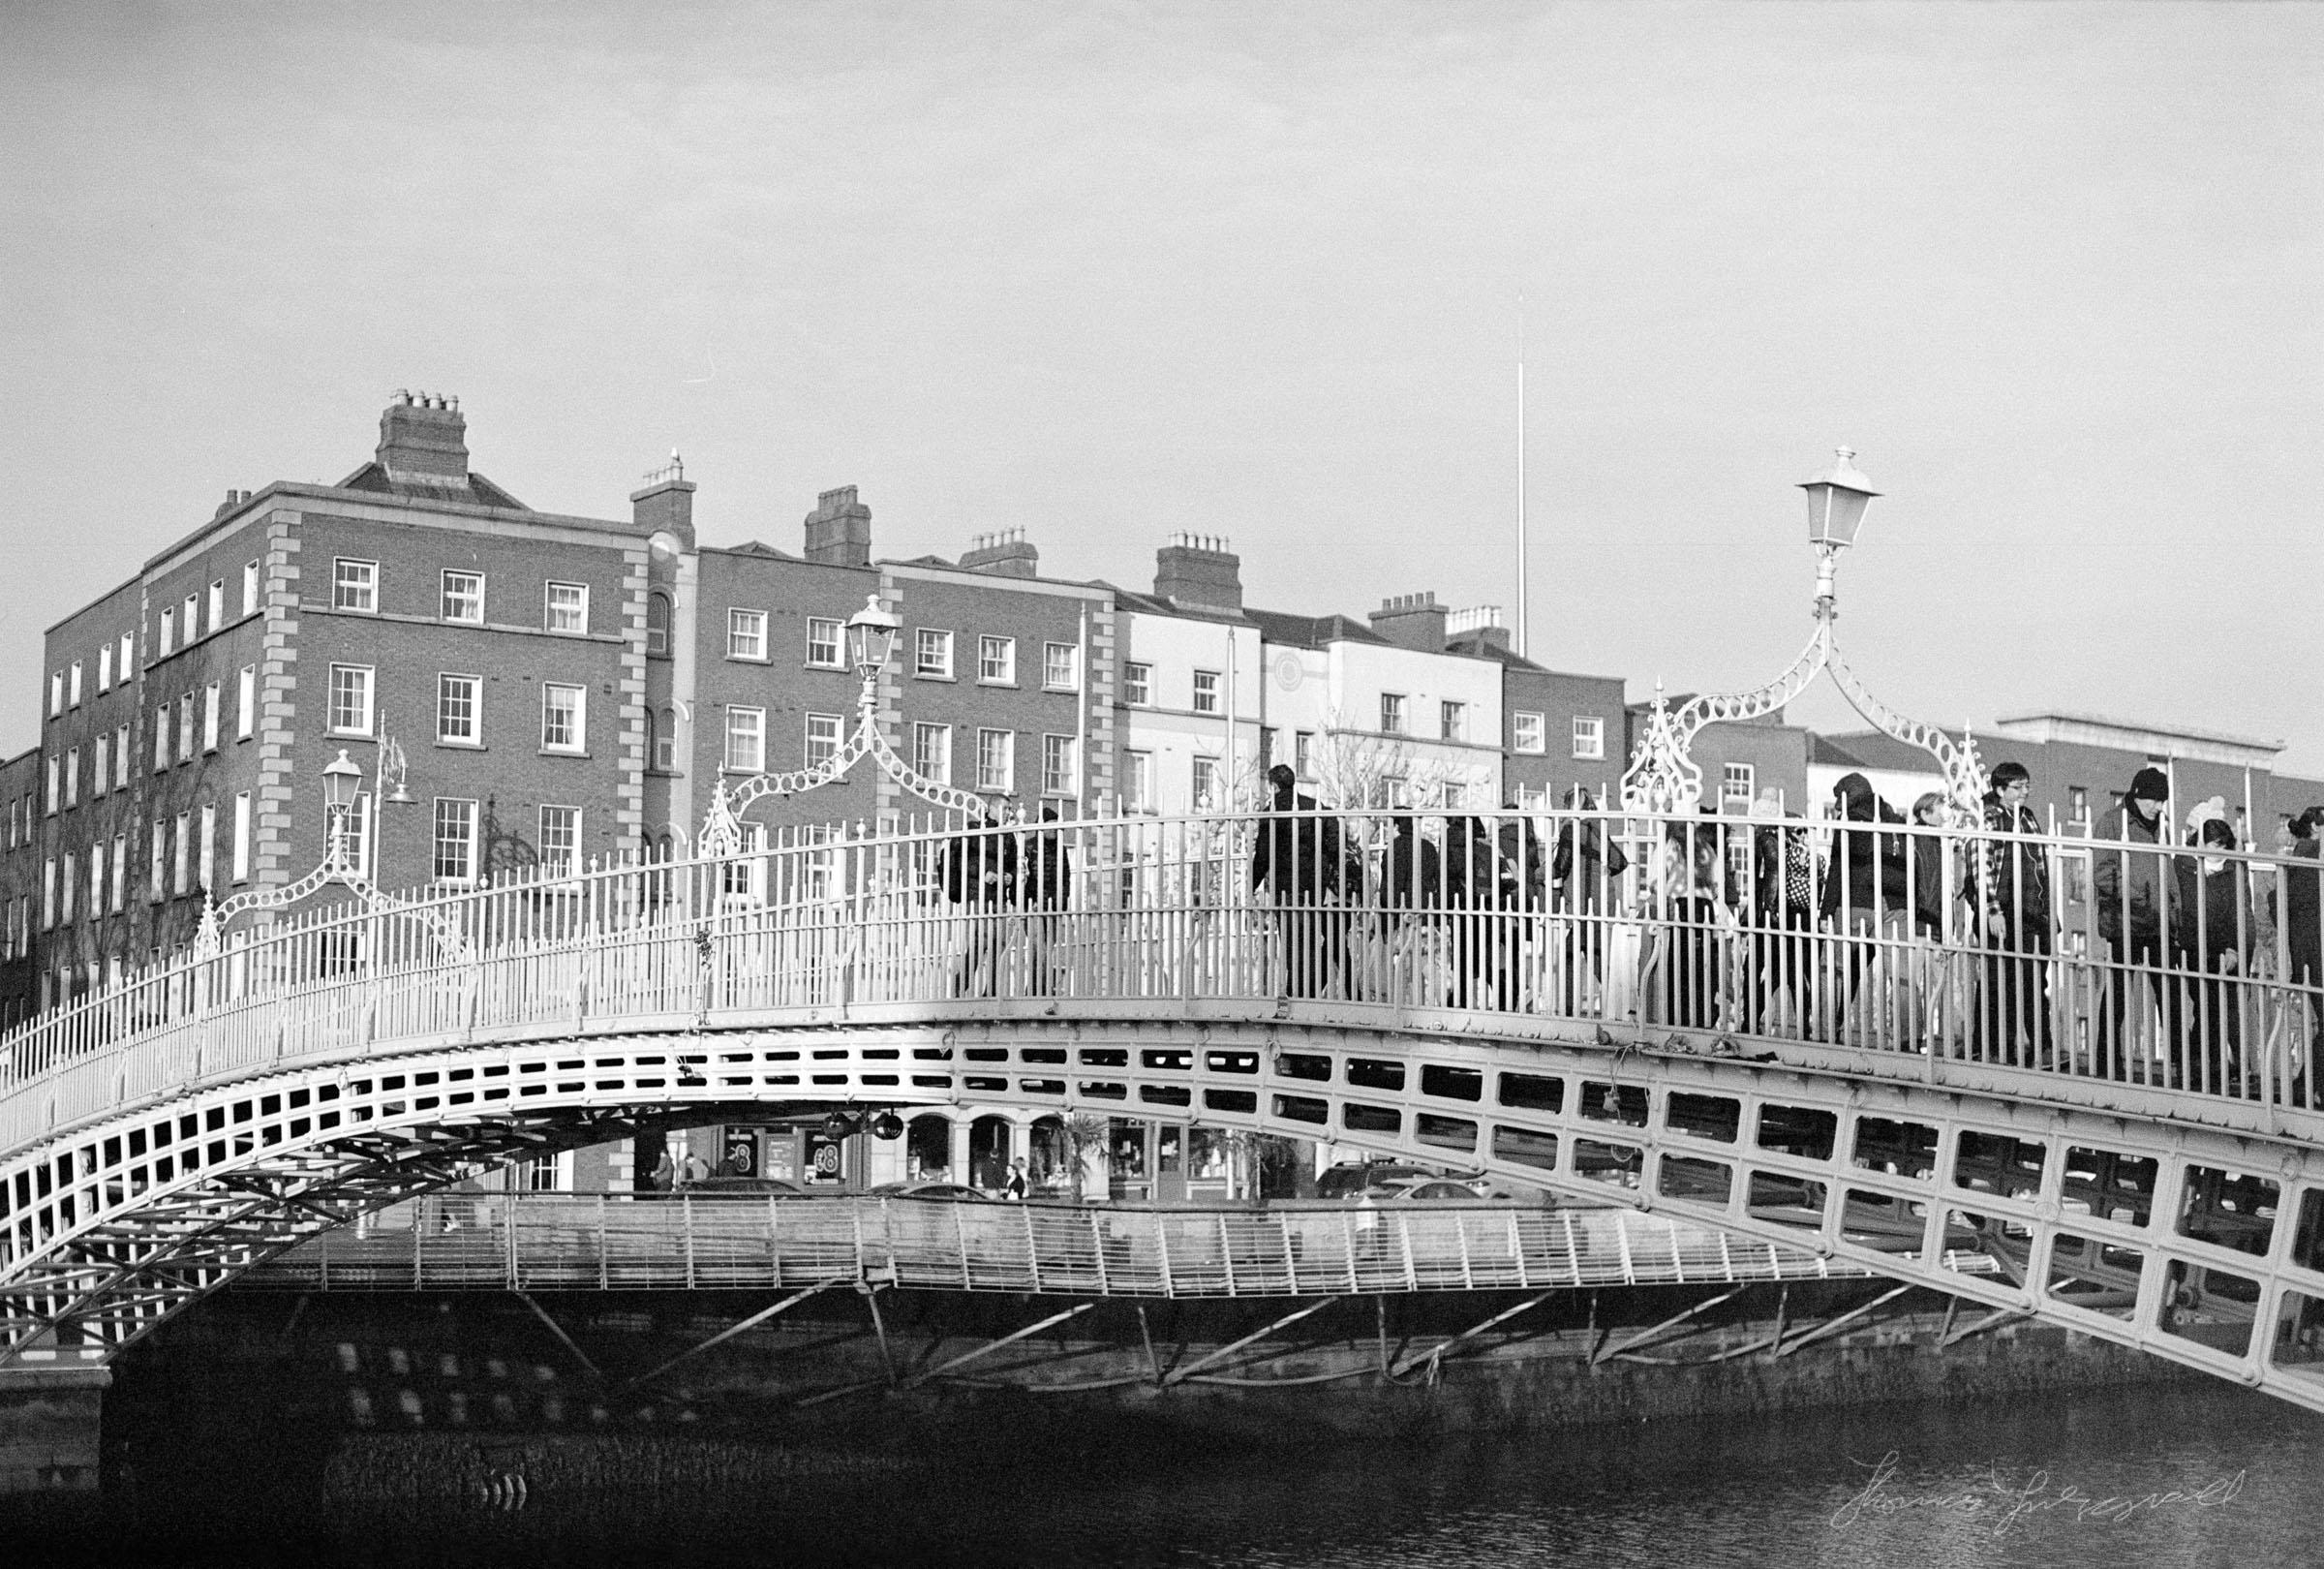 The Ha'penny Bridge Dublin in Black and White - Streets of Dublin